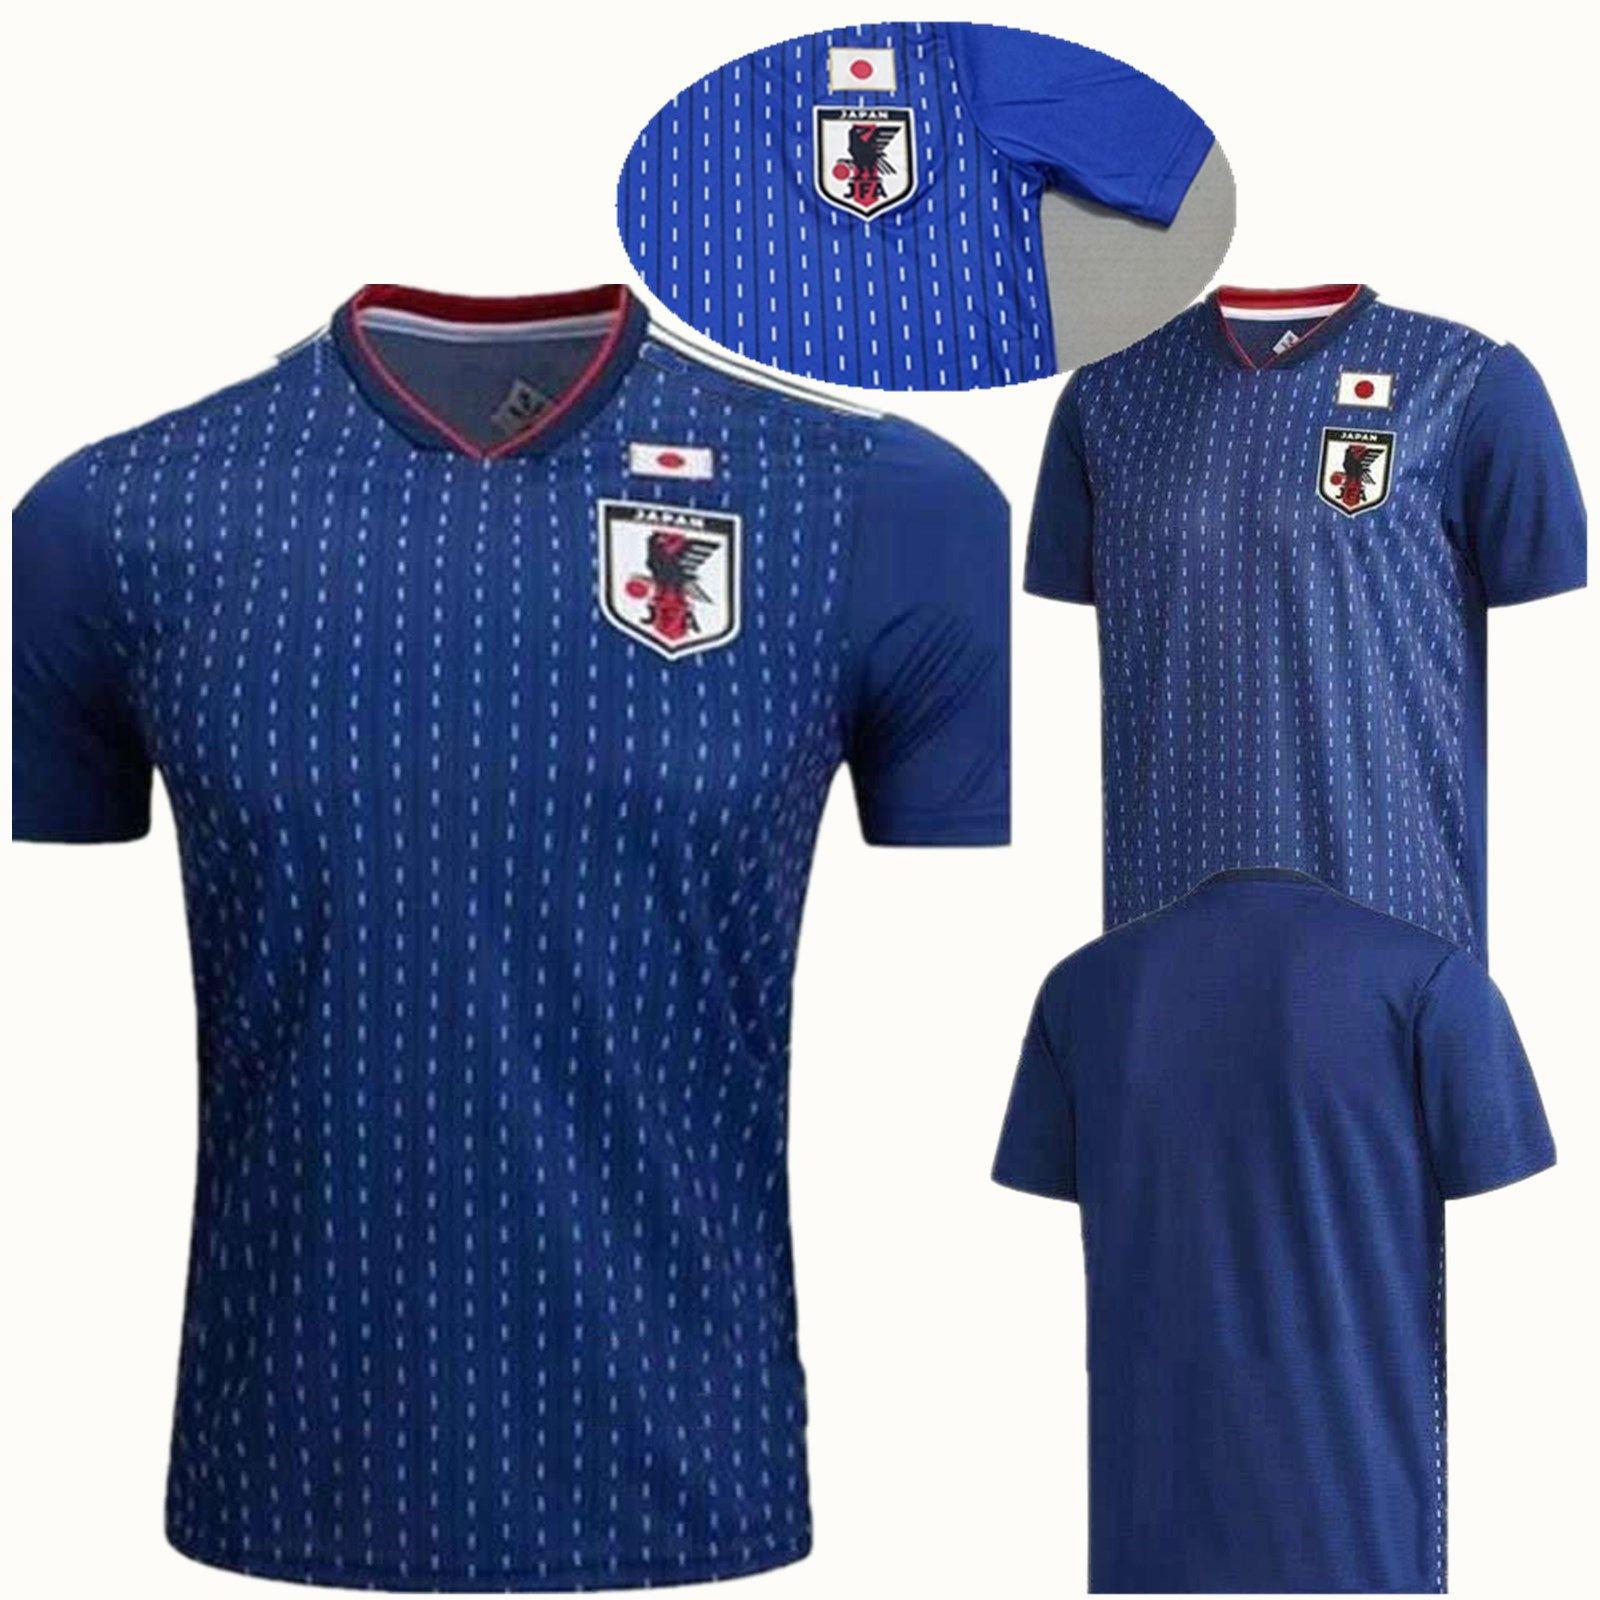 2019 Thai Quality 2018 World Cup Japan Soccer Jerseys OKAZAKI KAGAWA HASEBE NAGATOMO  2018 Japan Home Blue Japanese WC Football Shirts Kit From Huihuawang09 e047b35ea